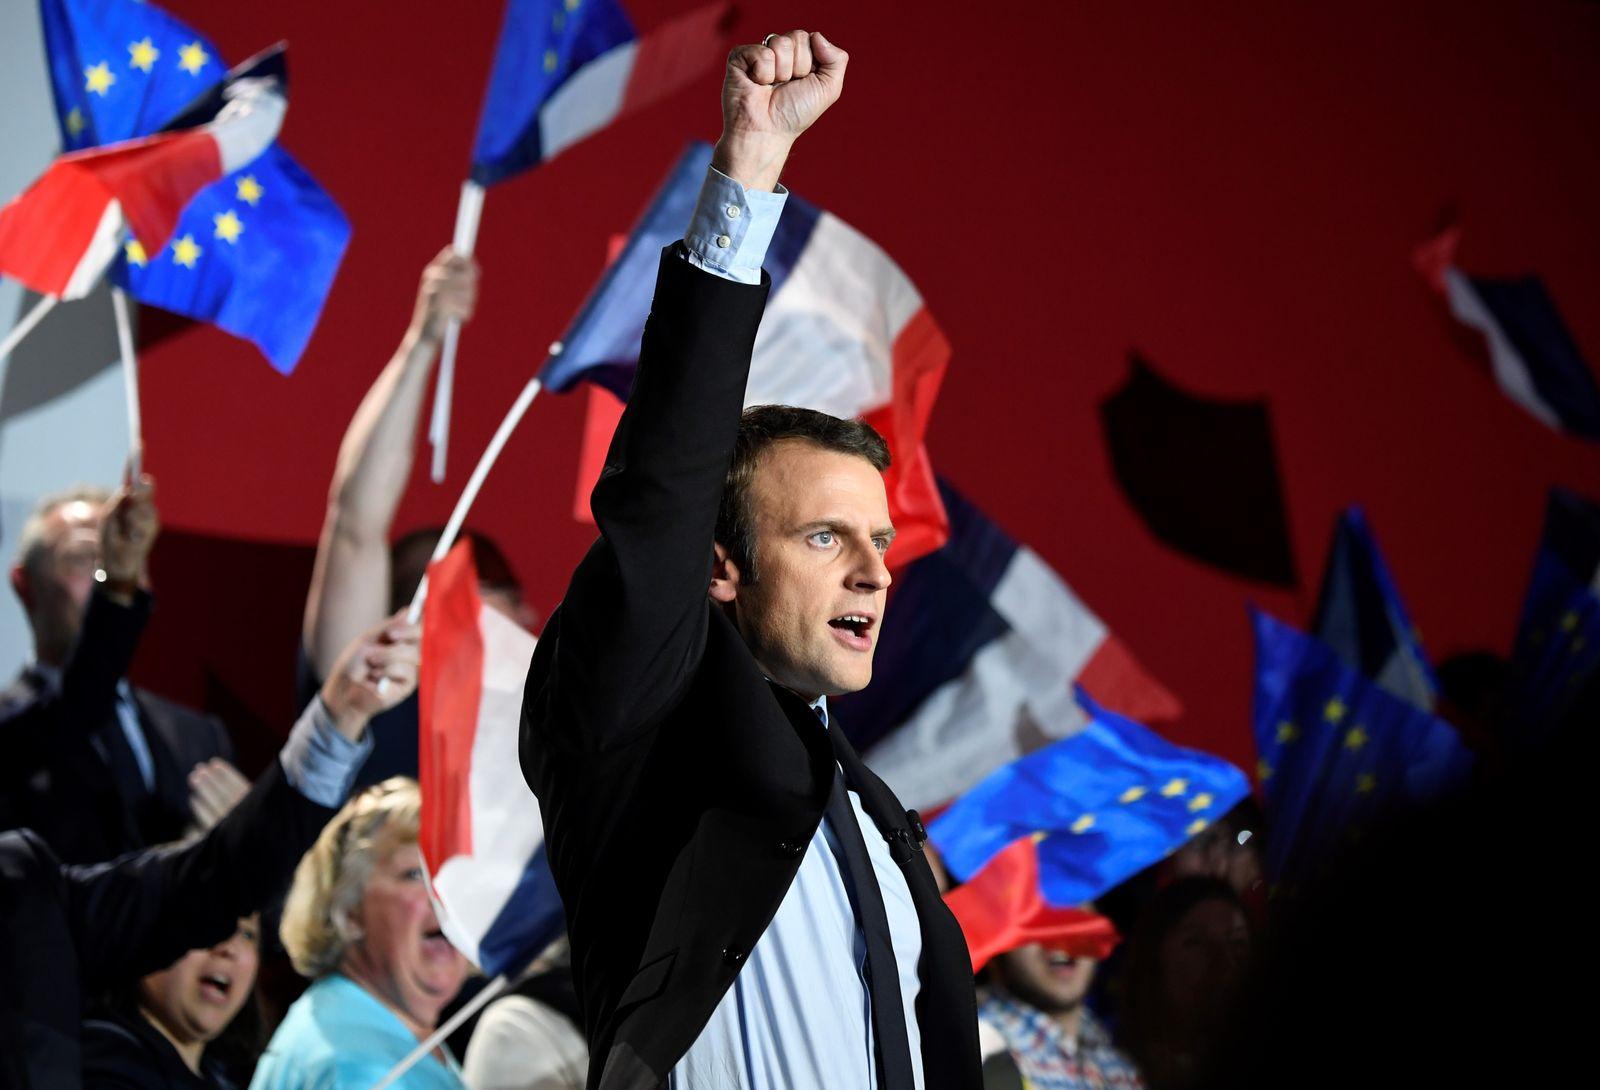 Macron / EU-Flagge